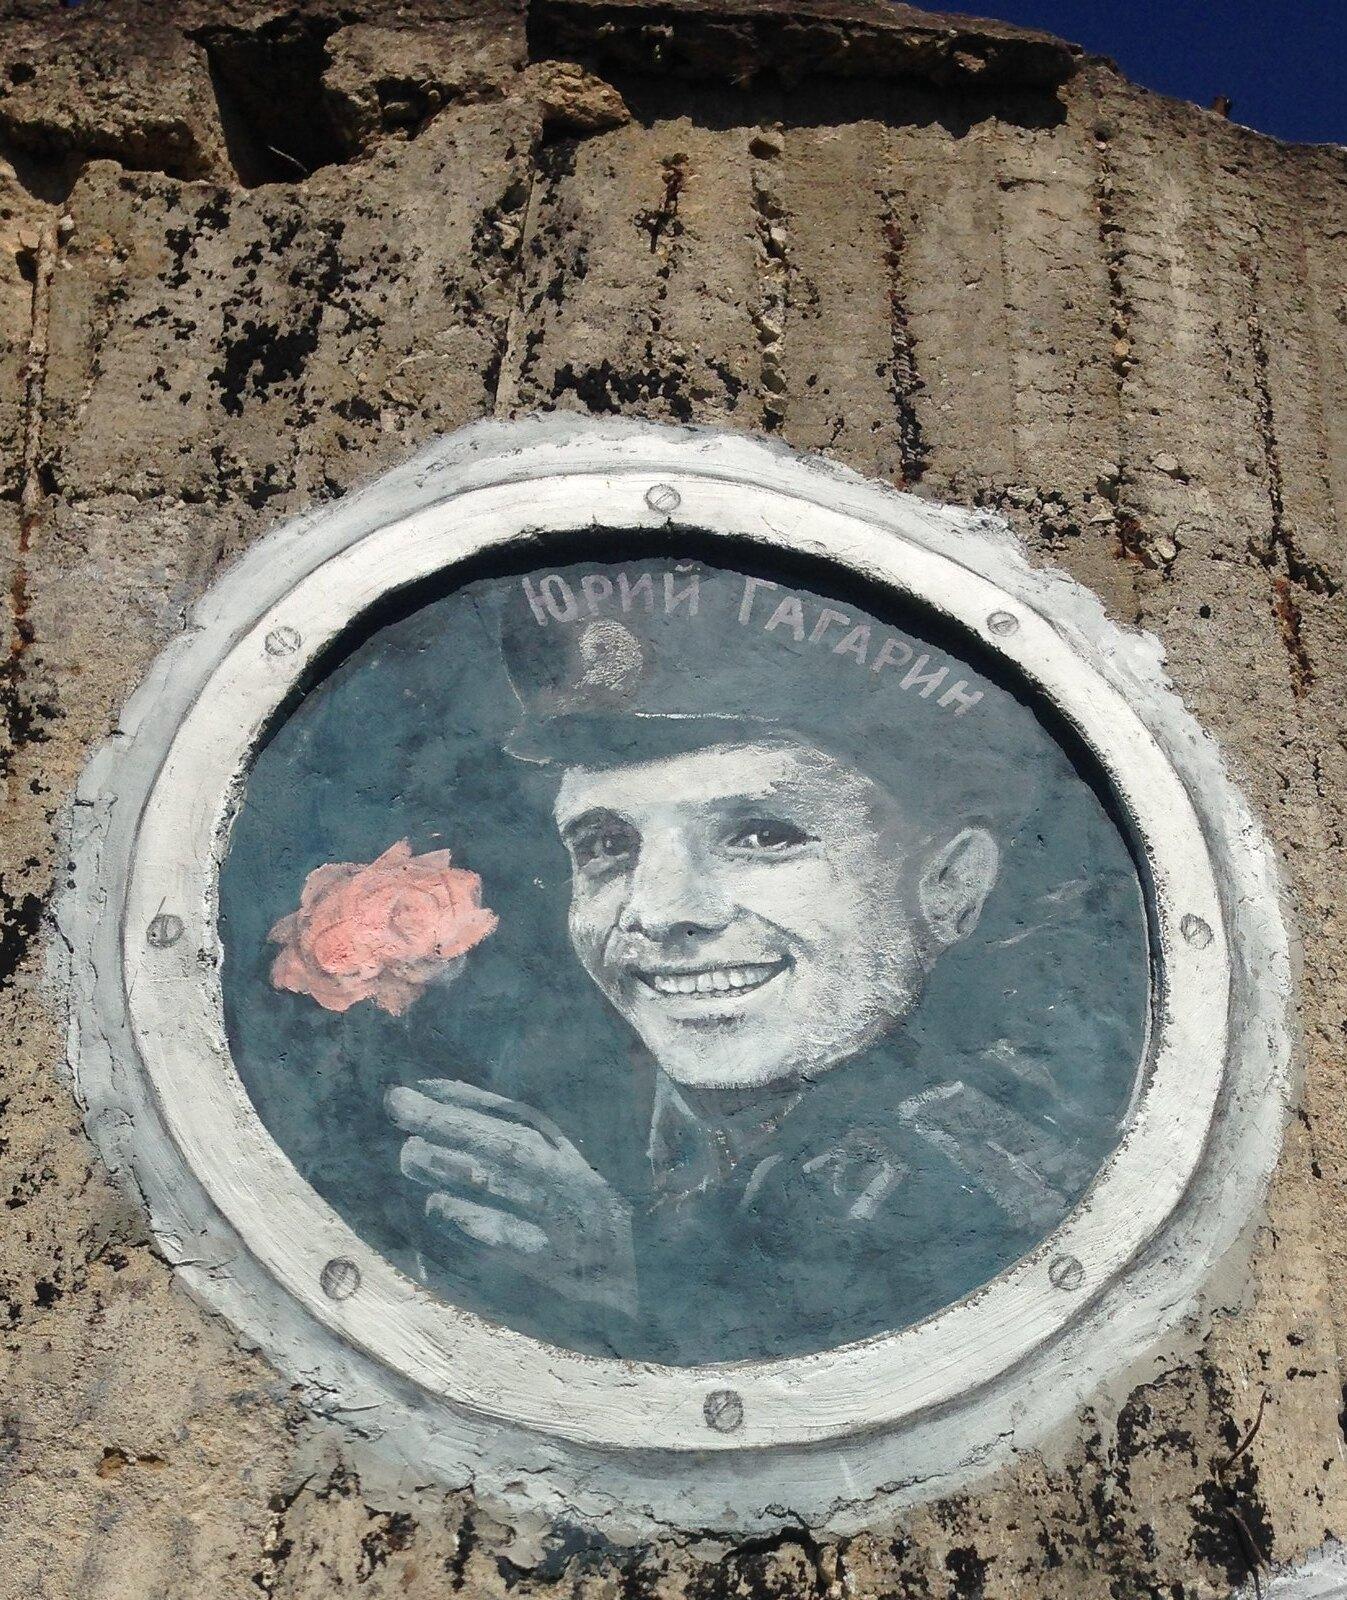 Космический ковчег. Юрий Гагарин